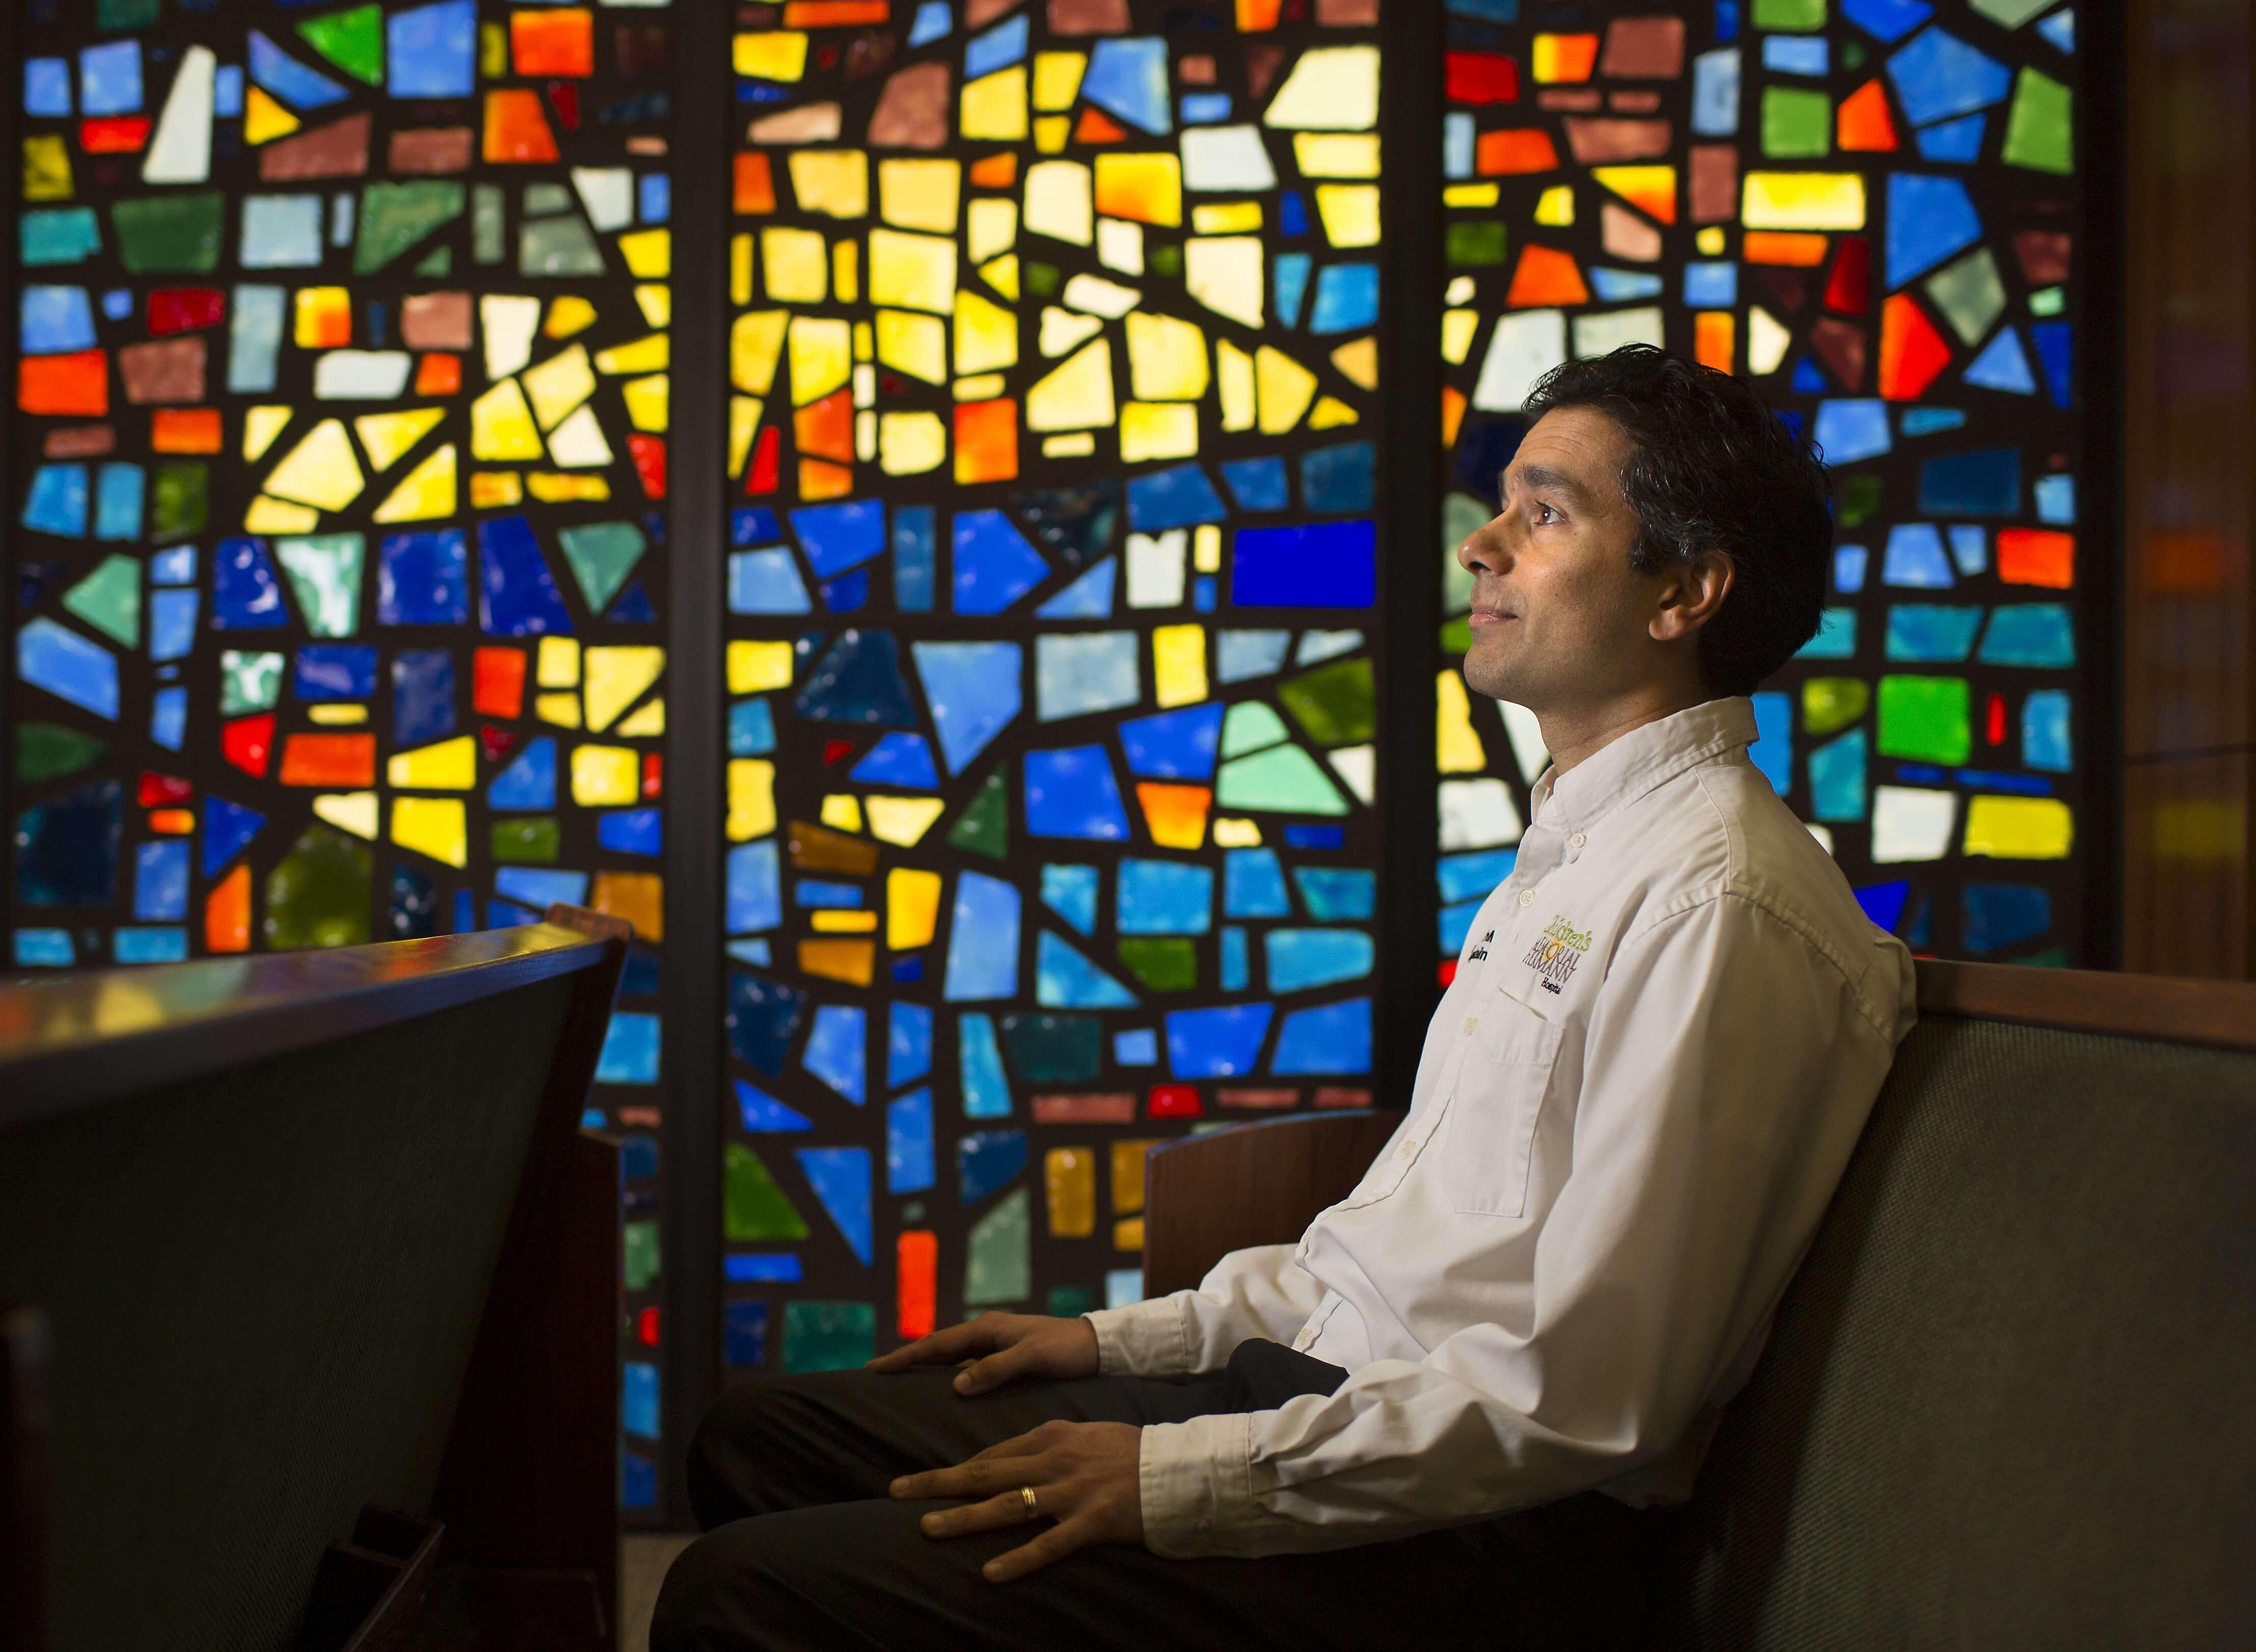 Joel Blest, a pediatric chaplain, in the chapel at Children's Memorial Hermann Hospital.